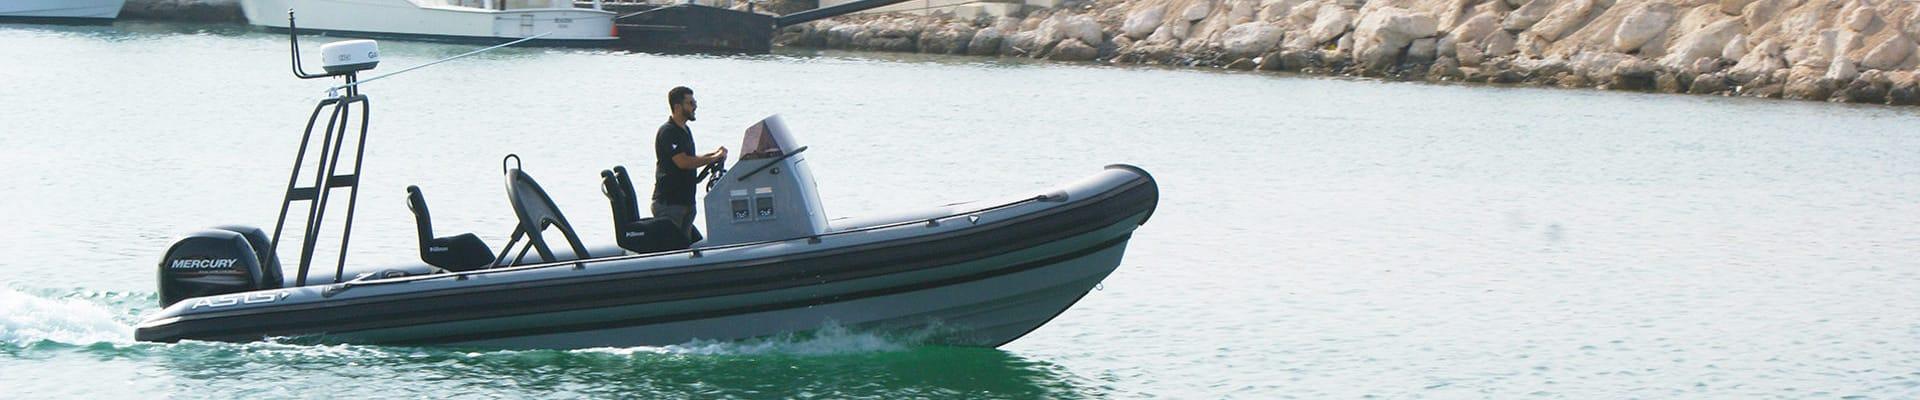 Coastguard-Rigid-Hull-Inflatable-Boats